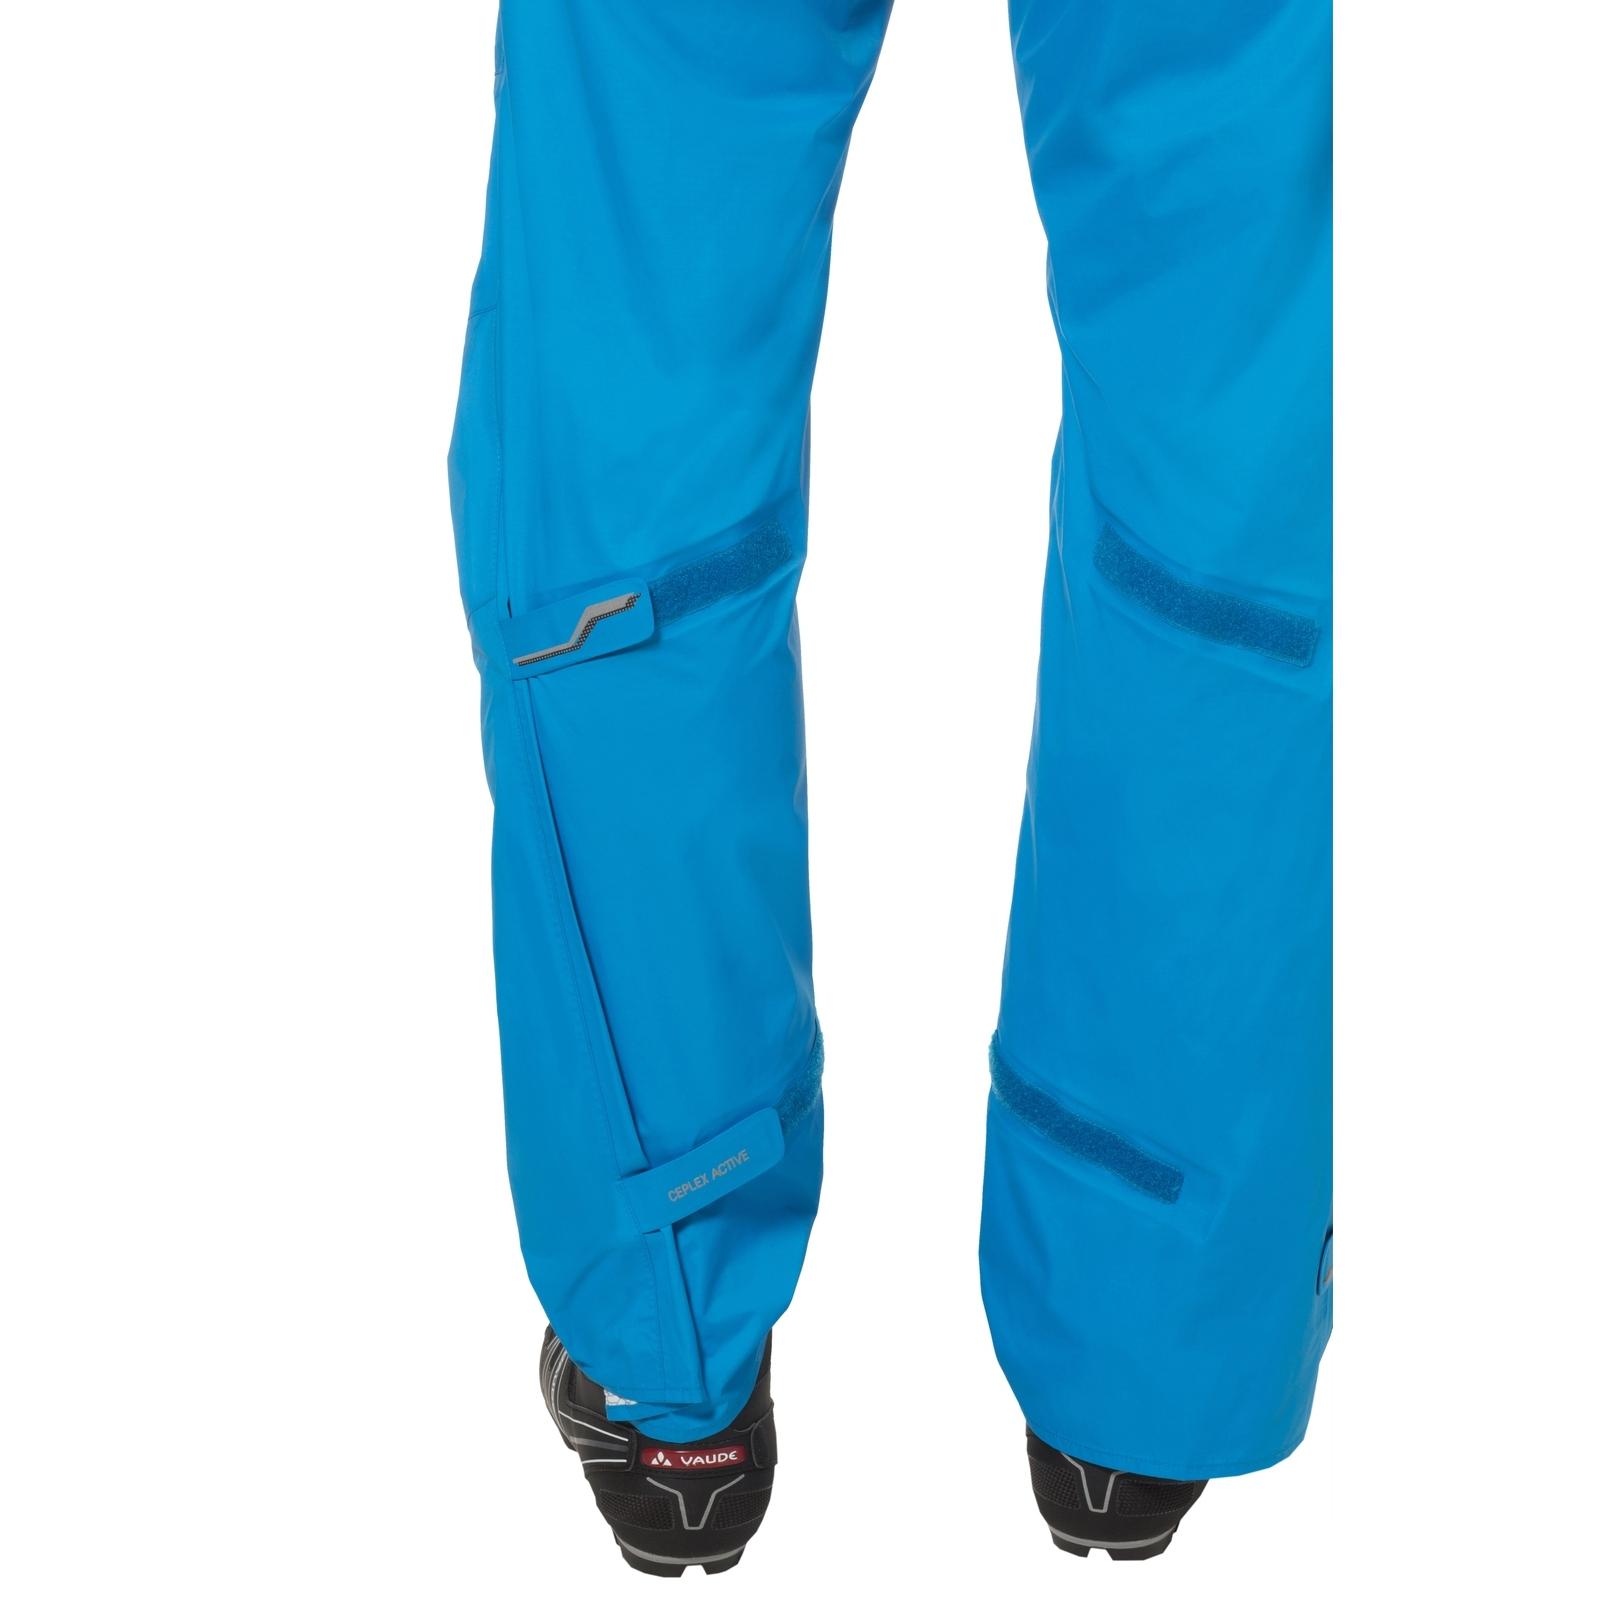 Bild von Vaude Drop II Regenhose - Regular - signal blue